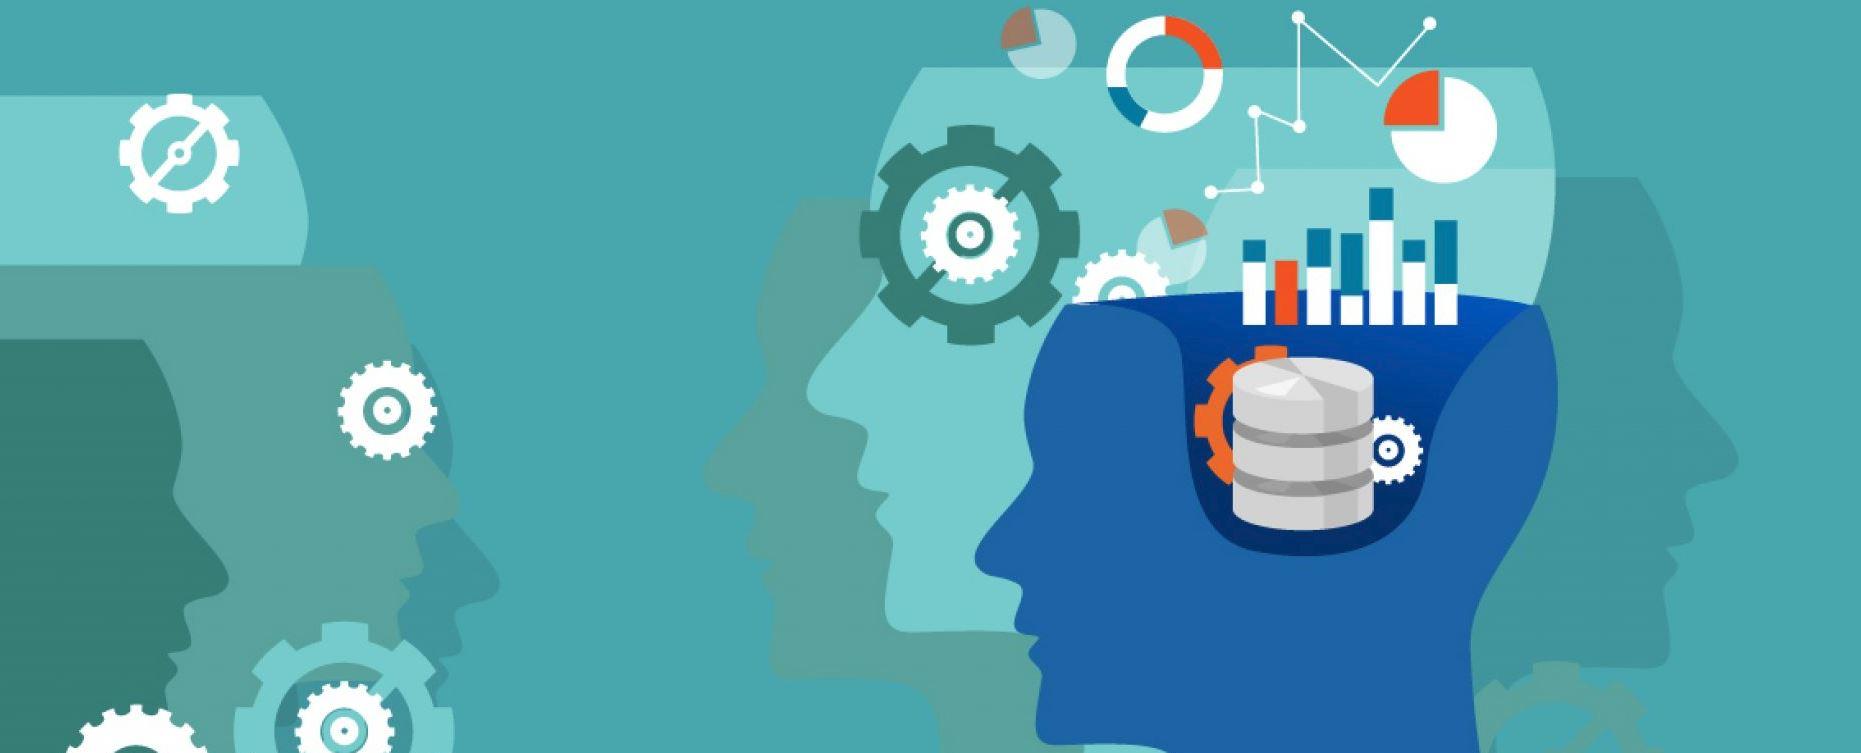 AI Machine Learning_for Analytics and BI